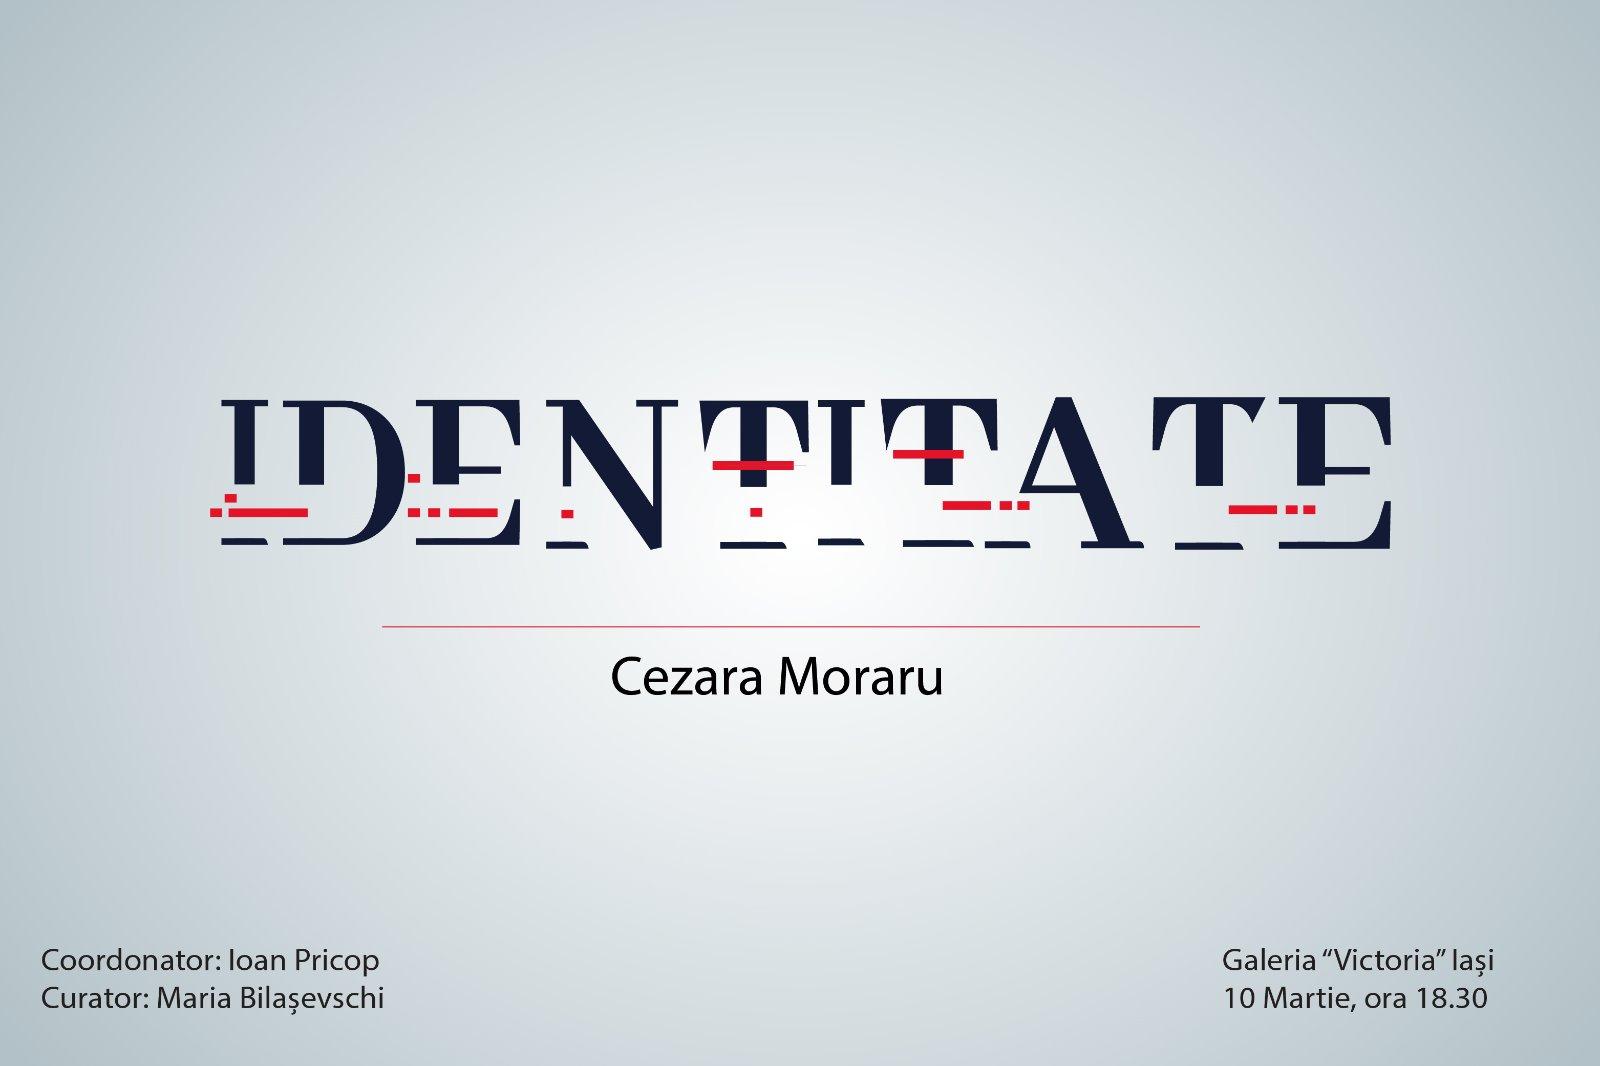 IDENTITATE – CEZARA MORARU